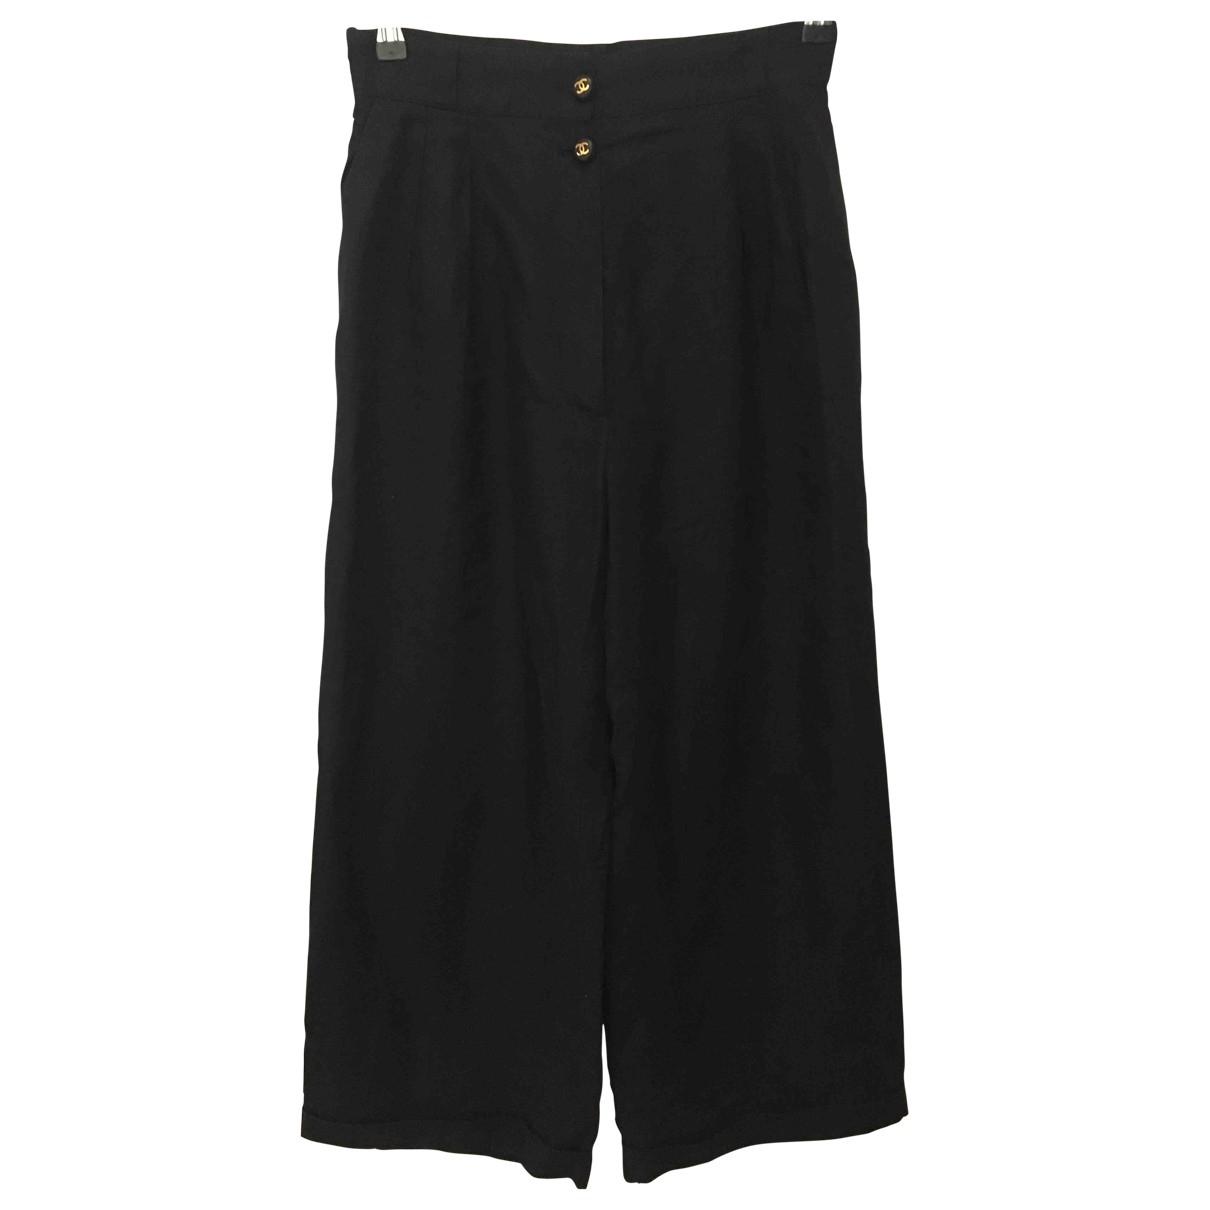 Chanel \N Black Linen Trousers for Women One Size FR